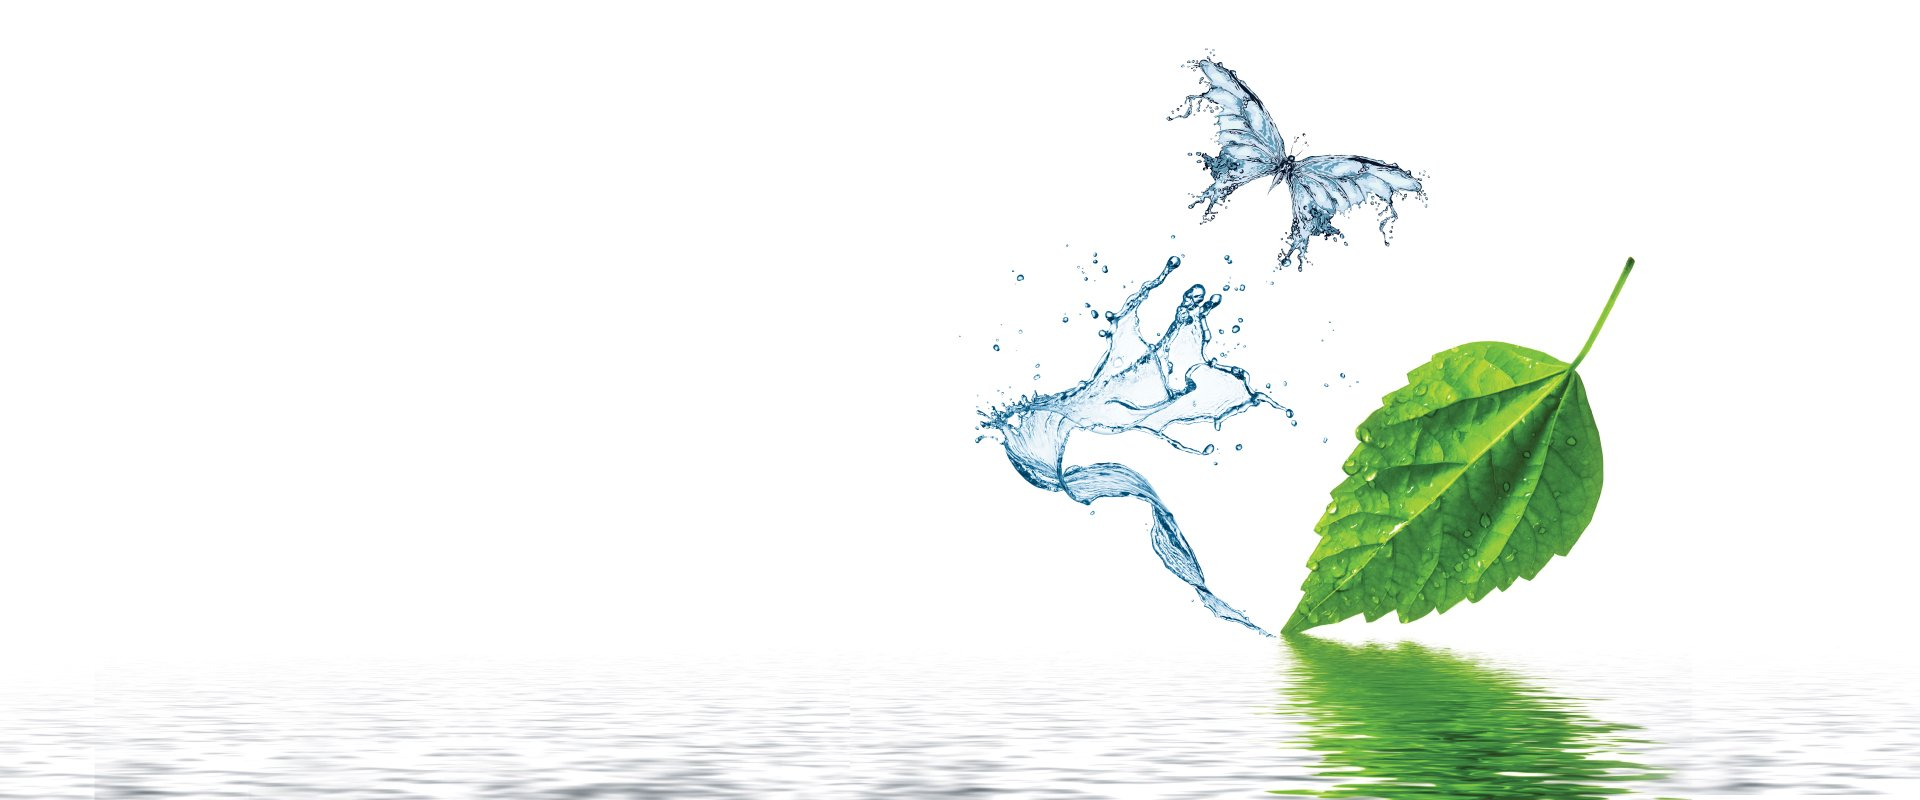 Malaysia Piping Solution: Plastic Pipe Distributor | Bina Plastic